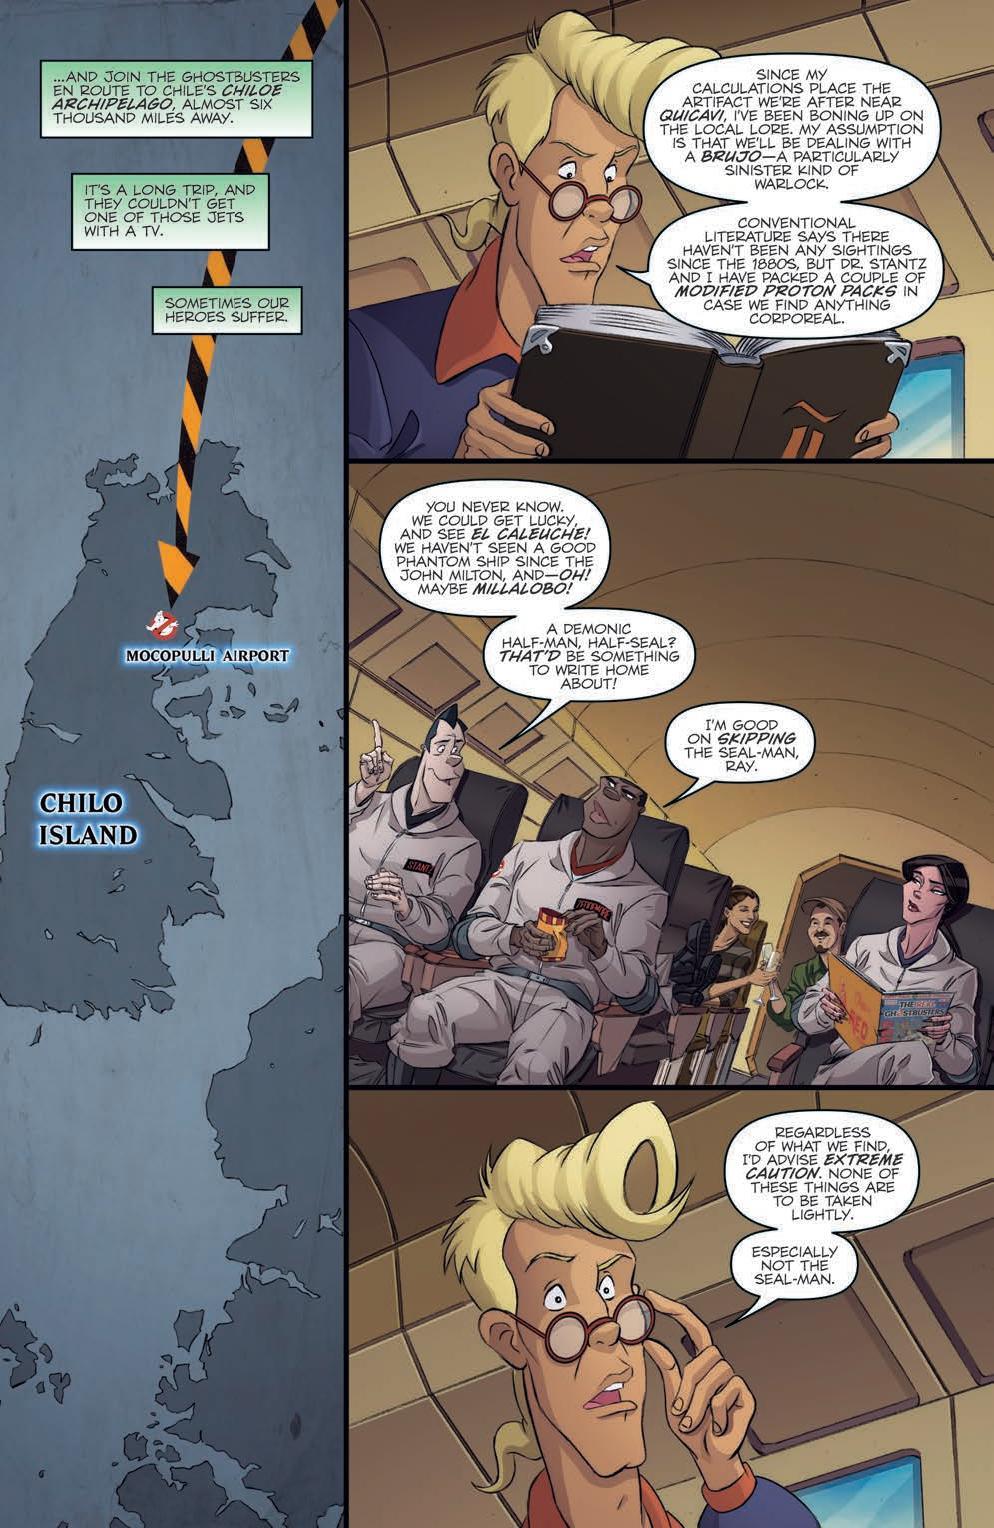 ghostbusters_international_09-pr-page-005